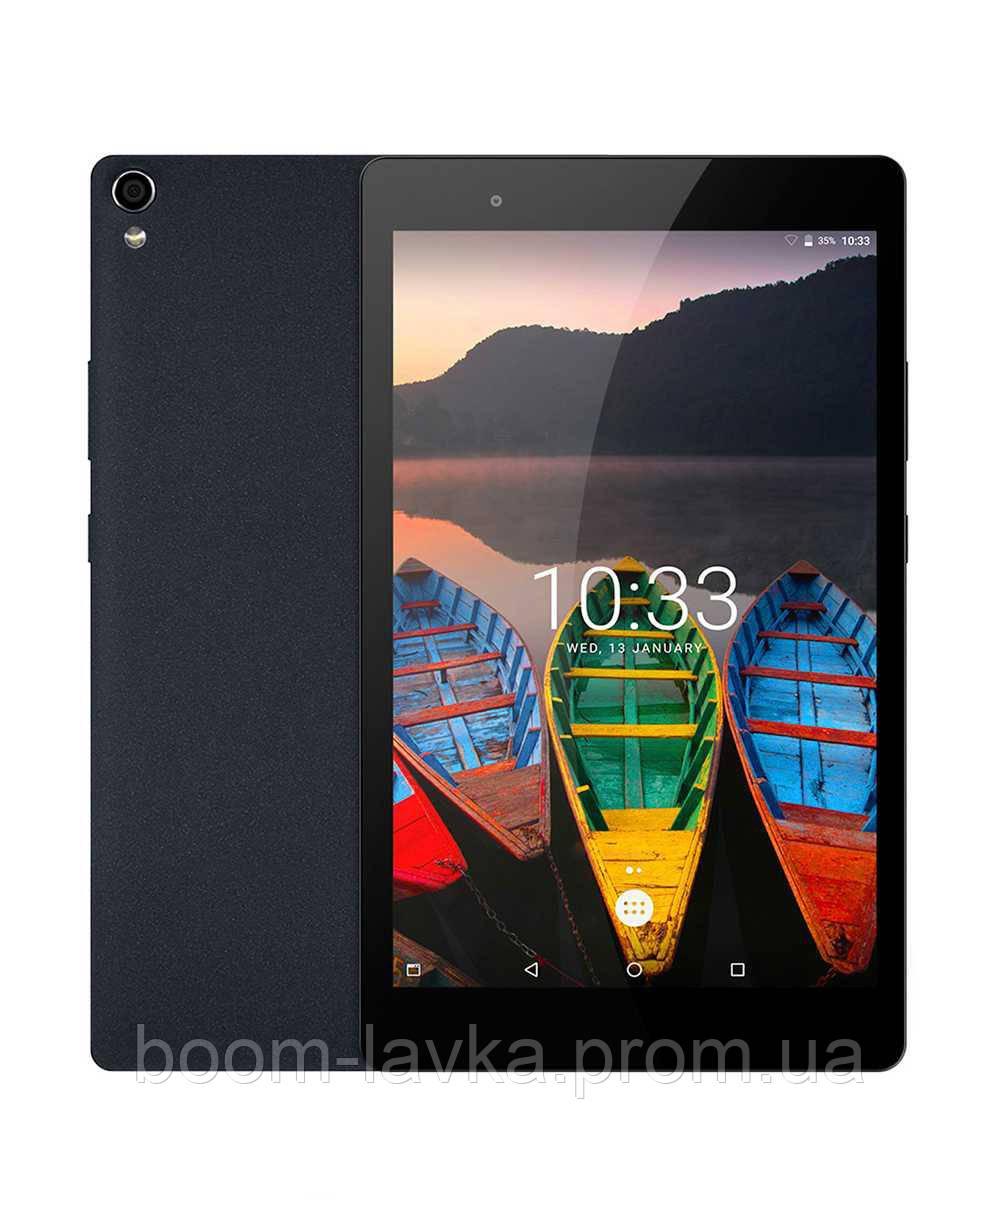 Планшет Lenovo TB-8703F Plus 8 16Gb Black Snapdragon 625 8